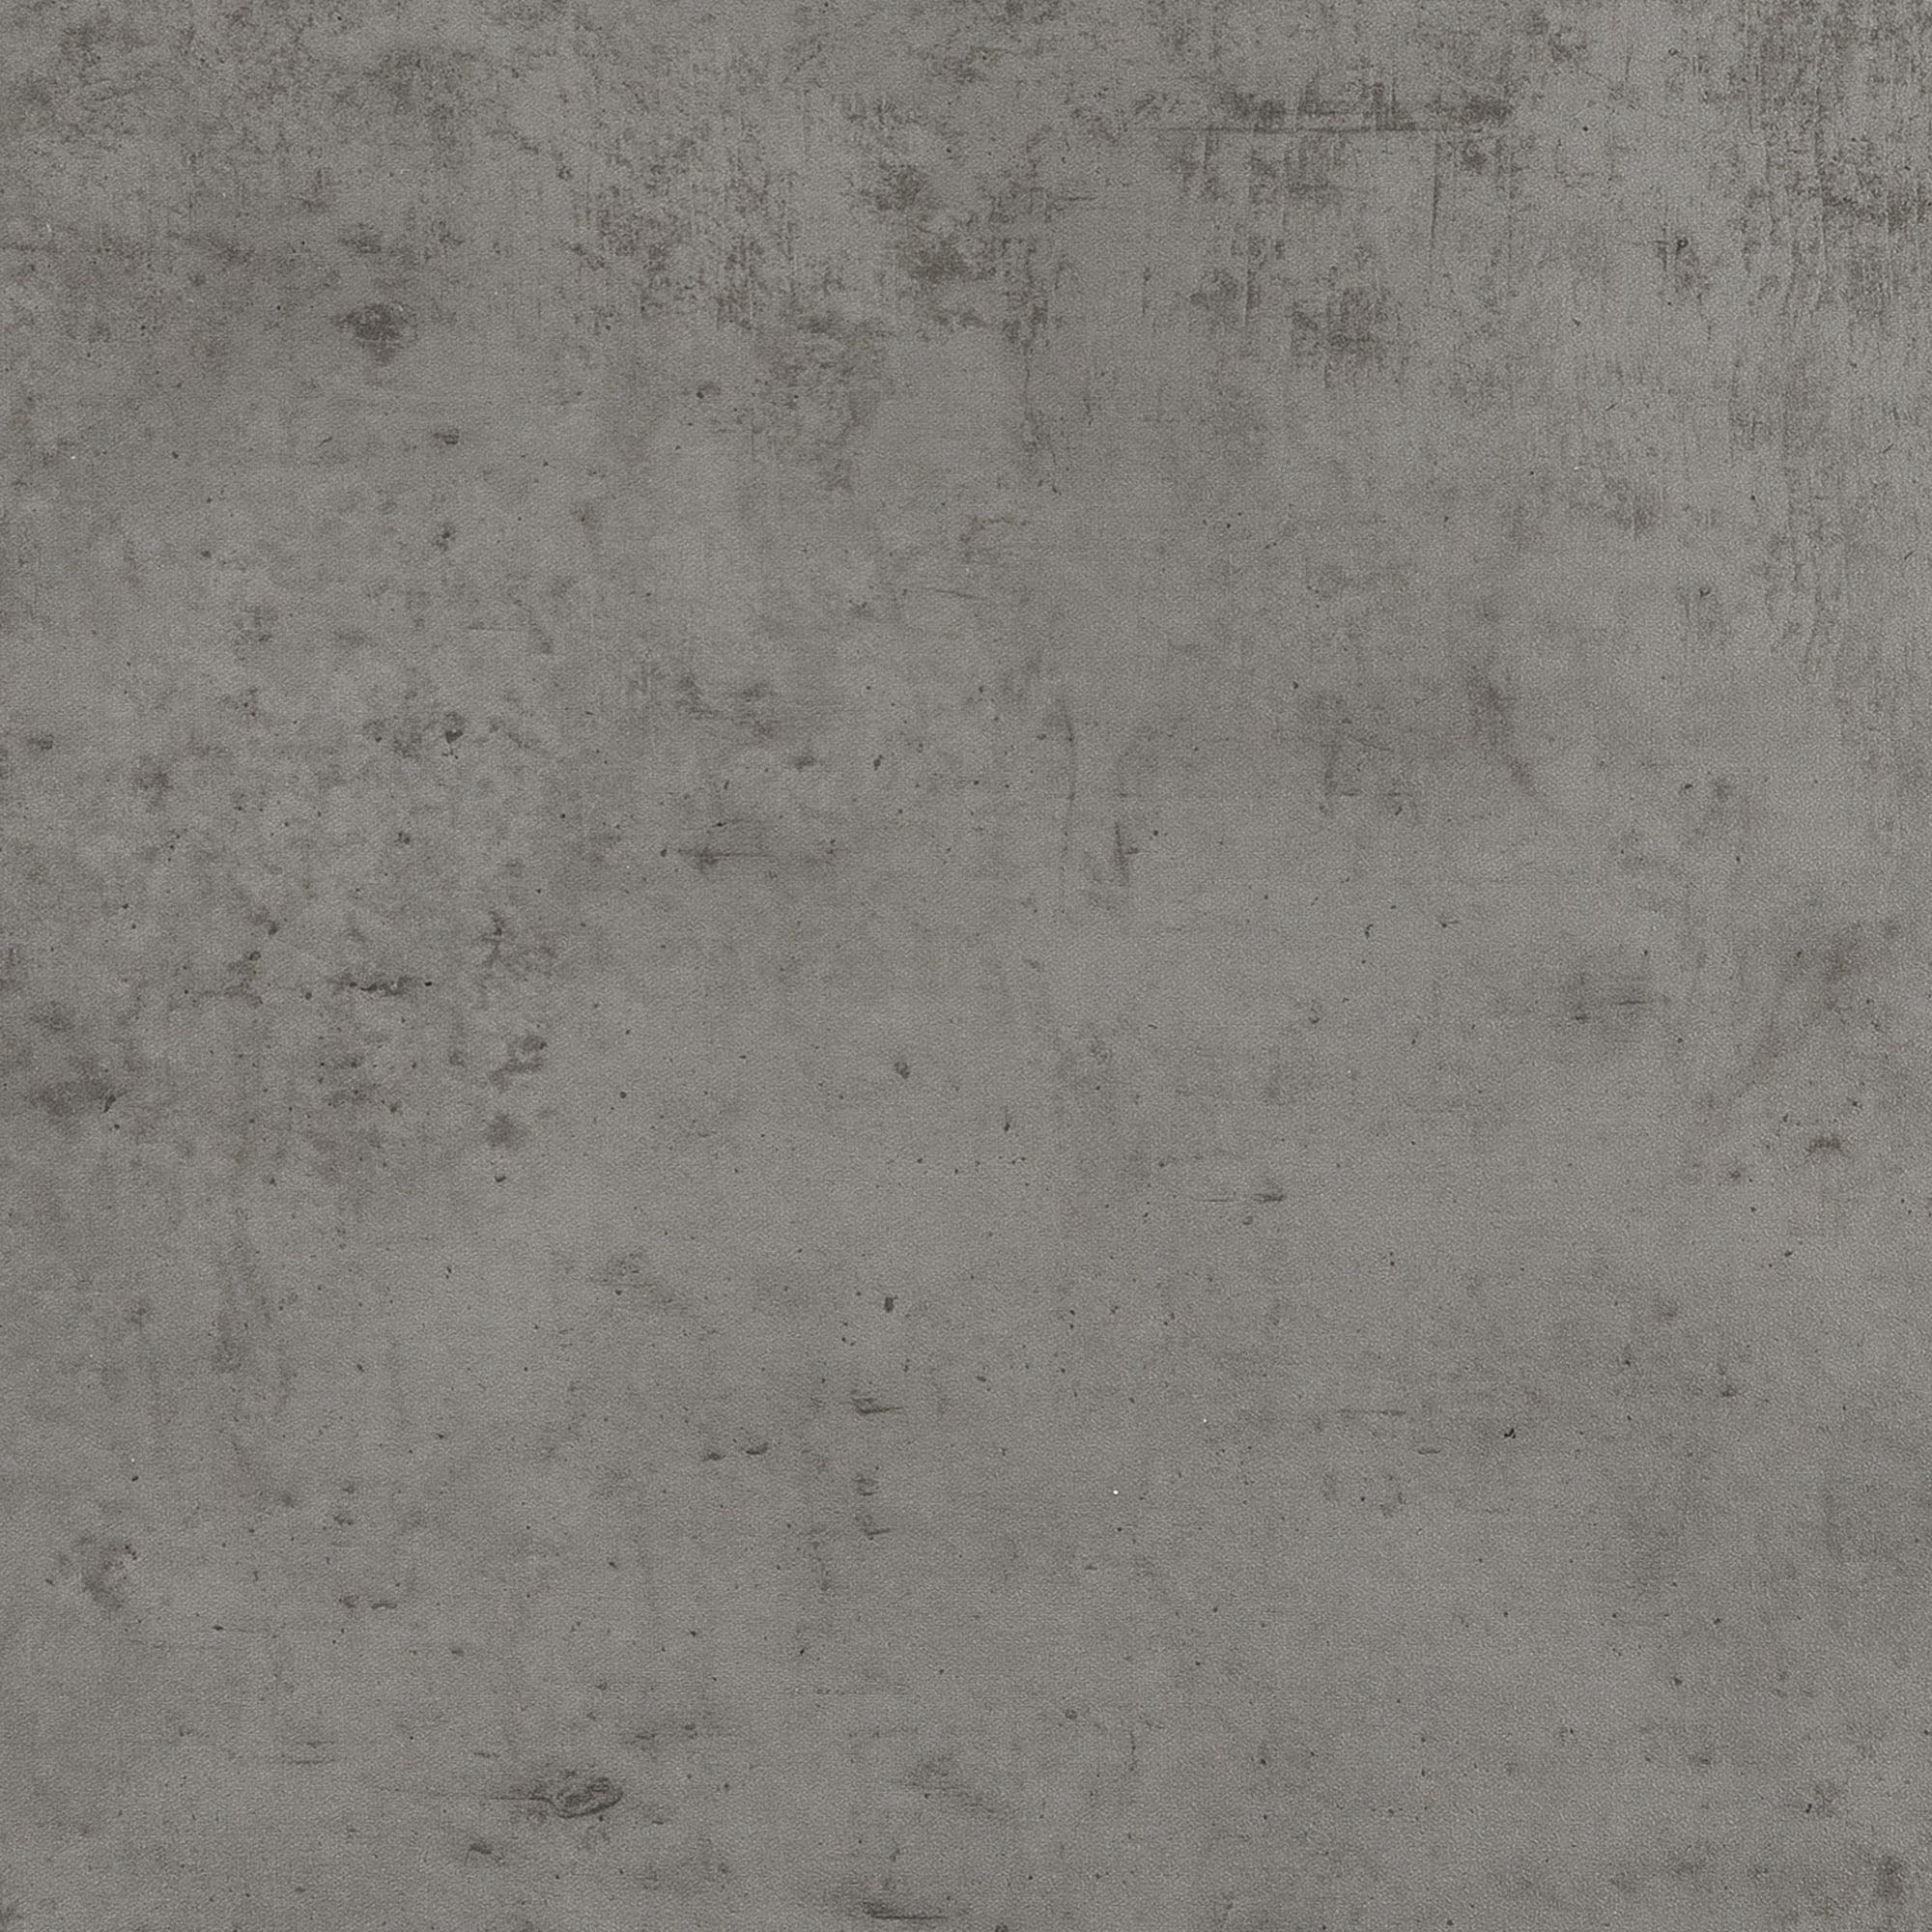 Interlocking Vinyl Wall Tile by DumaWall - Waterproof ...